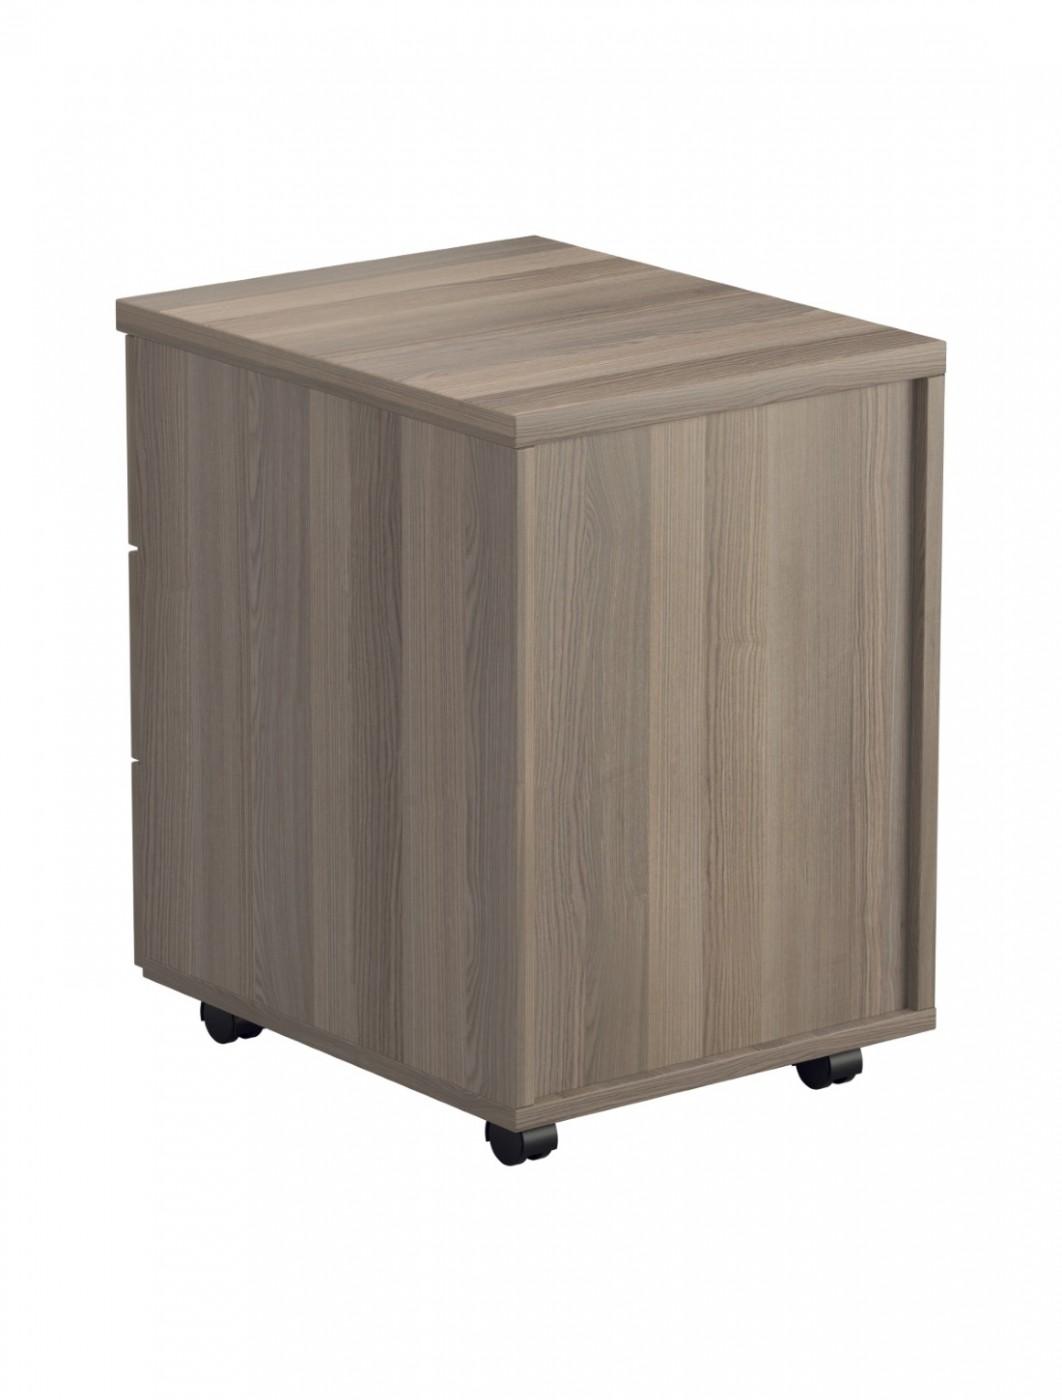 Office Furniture - Mobile Pedestal TESMP3 Office Storage